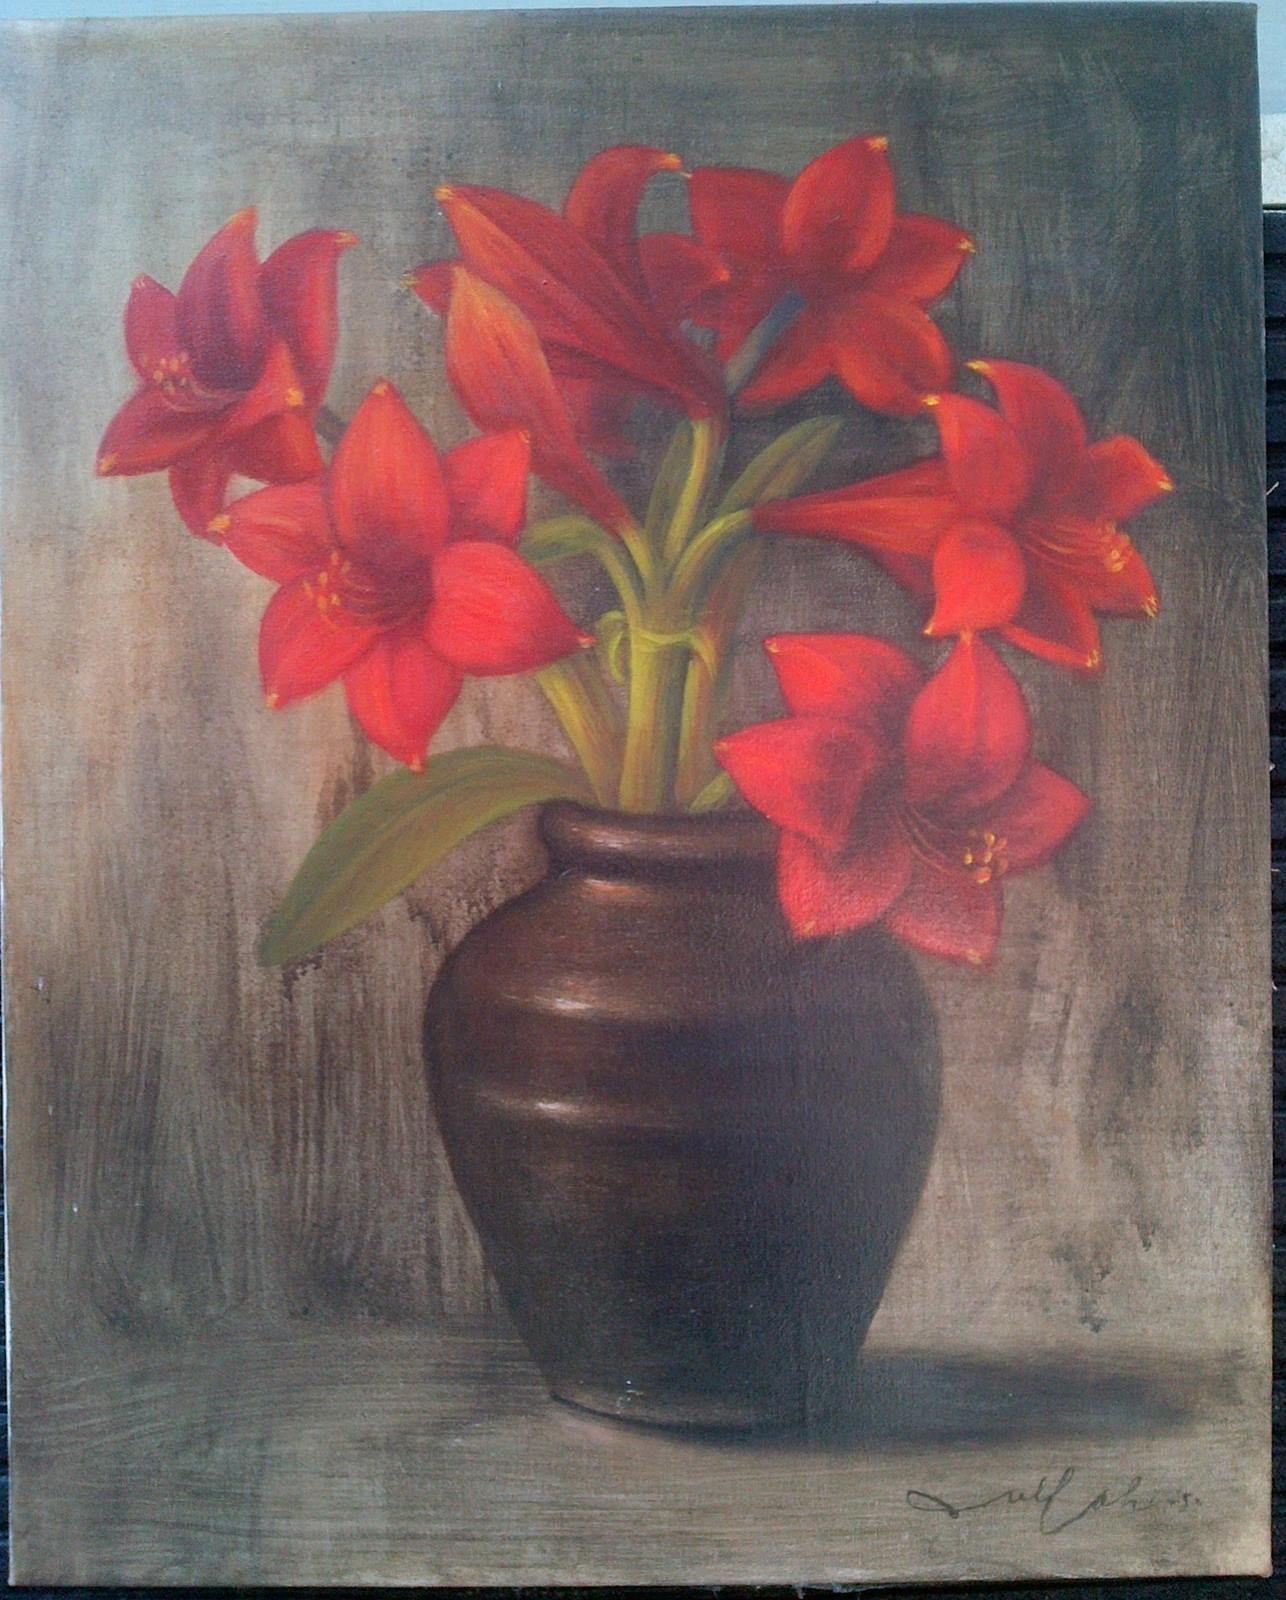 Jual Lukisan Bunga Oil On Canvas 30 70 Cm Rp 450 000 850 000 Nego 087838671118 Lukisan